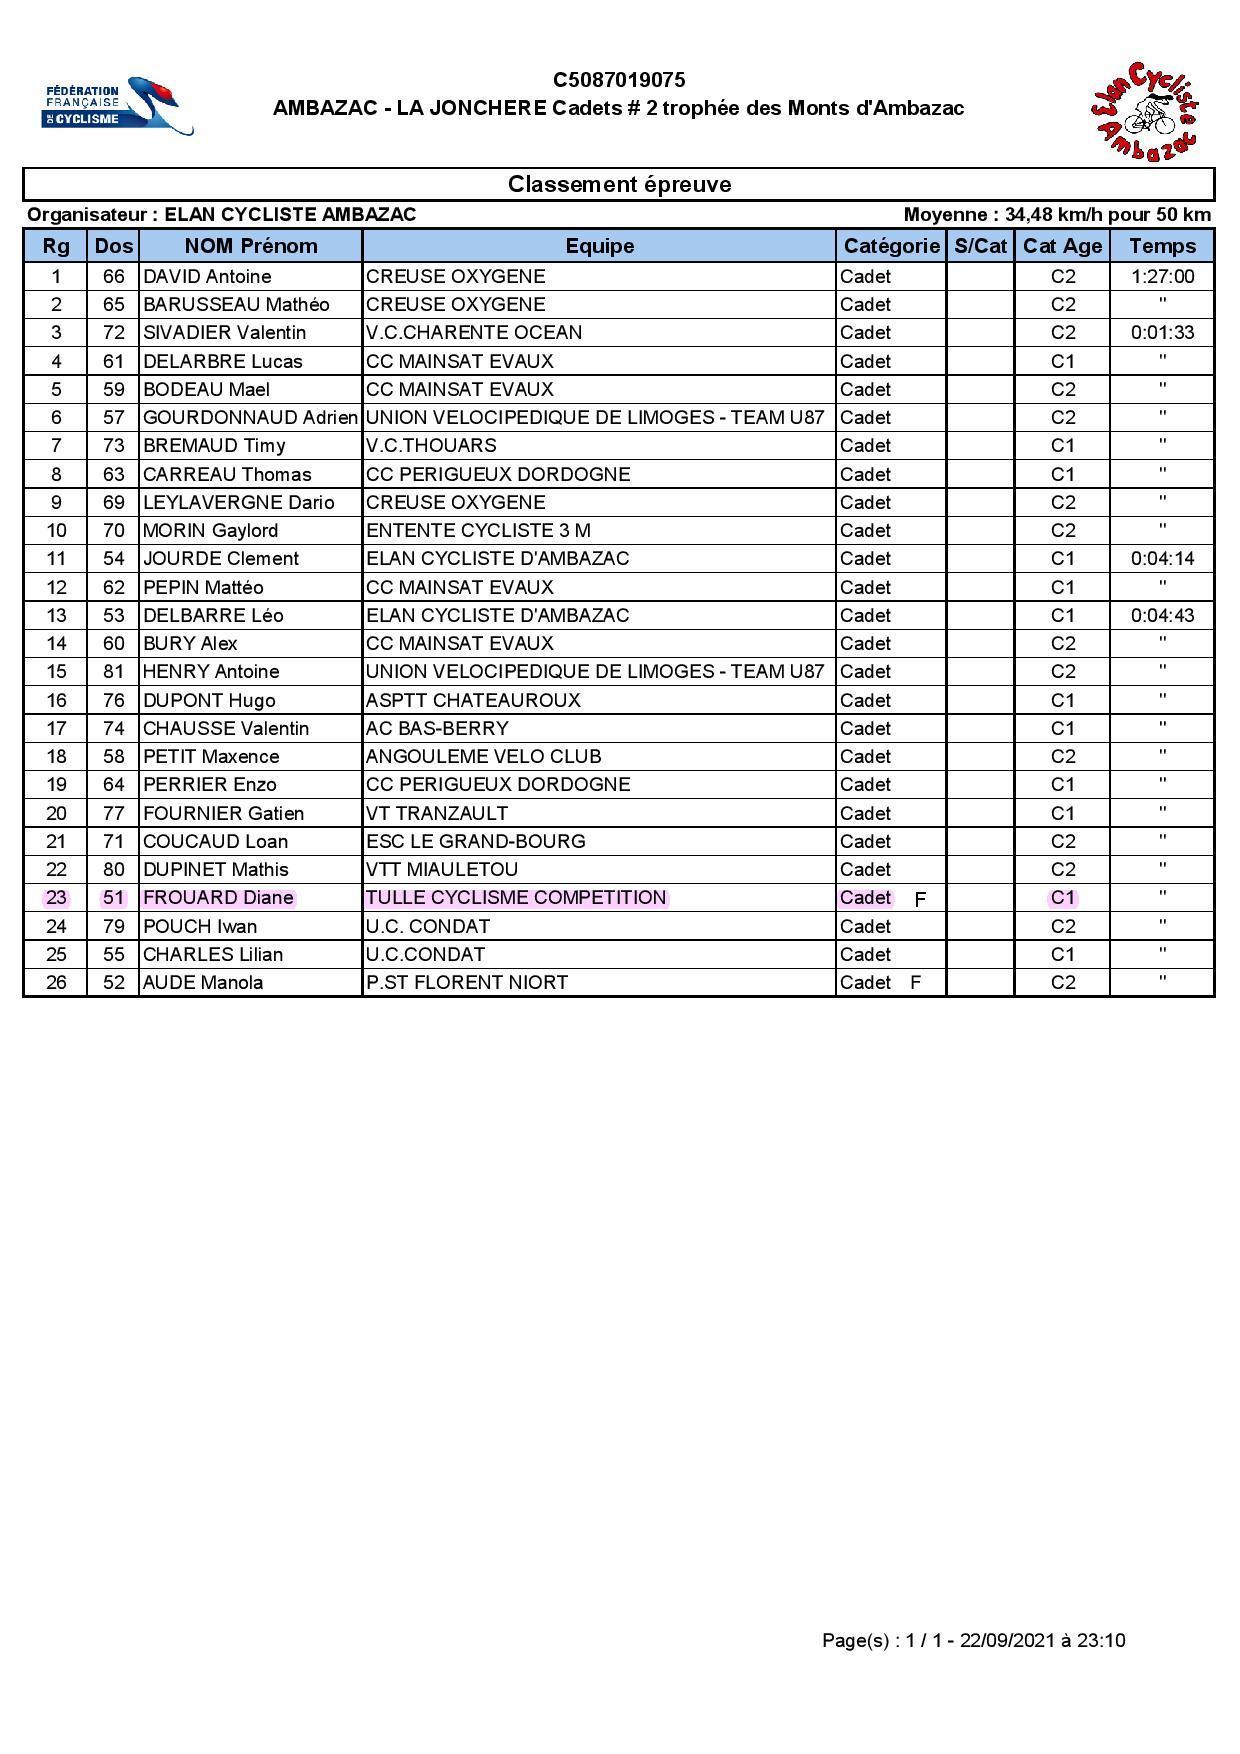 Cadets classement course 19 09 2021 page 001 3